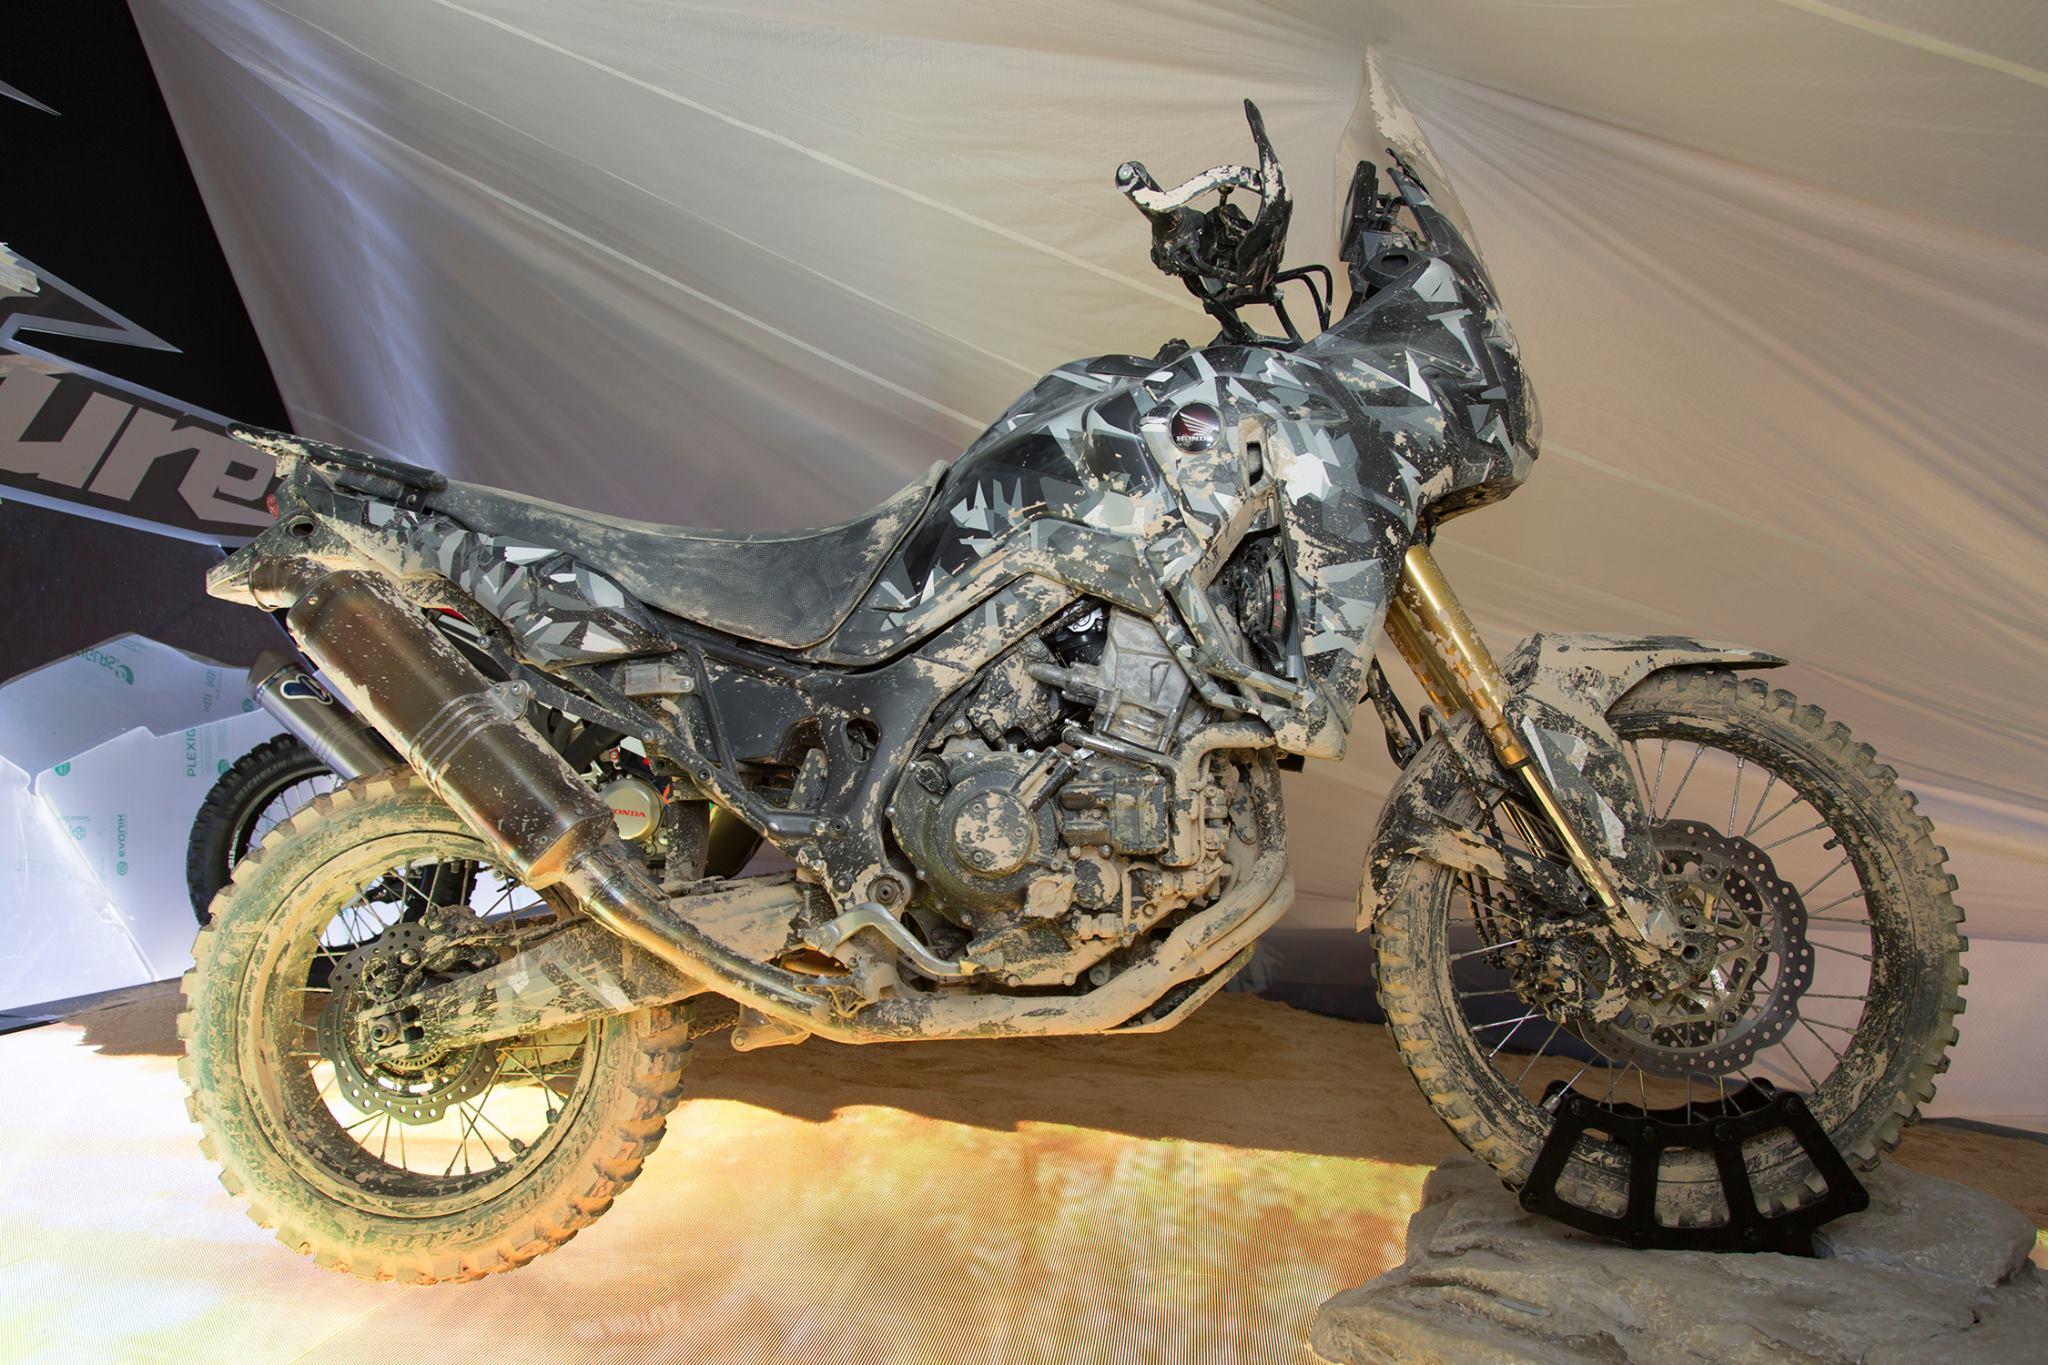 Honda's new Africa Twin